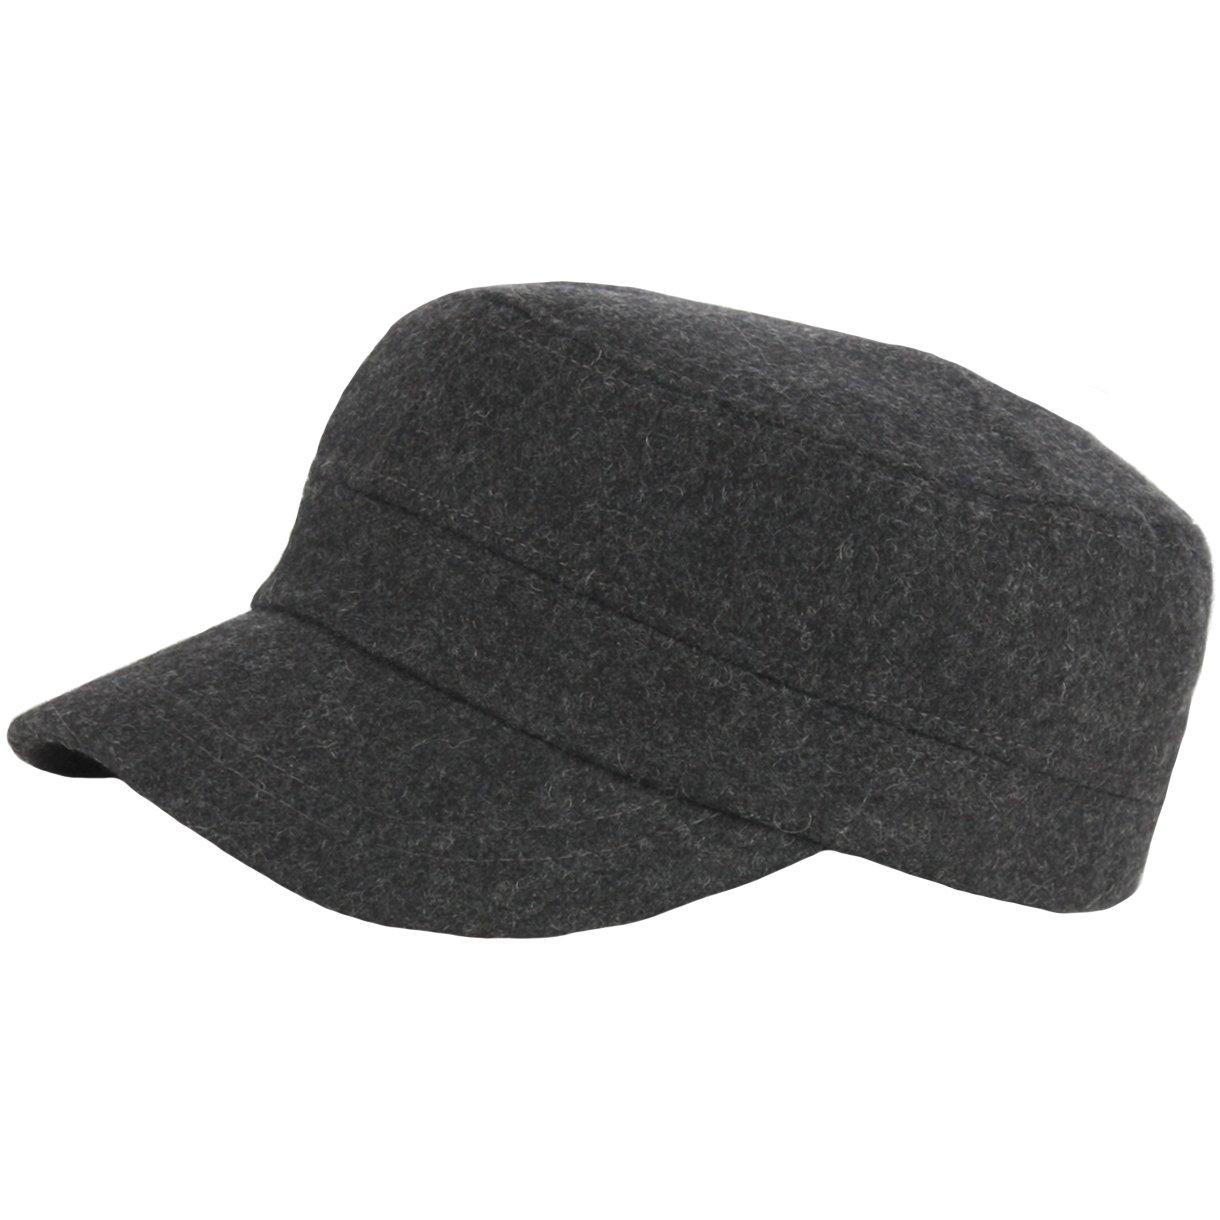 d3ac489a859 RaOn A154 New Fashion Wool Winter Warm Simple Design Club Army Cap Cadet  Military Hat